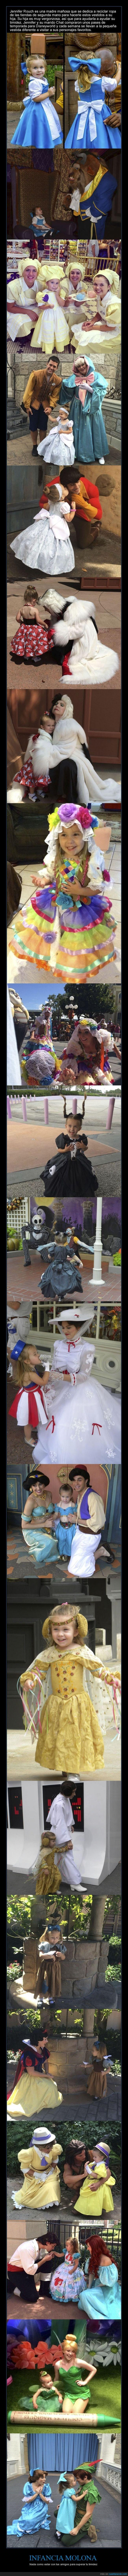 disfraz,disney,infancia,jennifer rouch,jugar,niña,orlando,personaje,traje